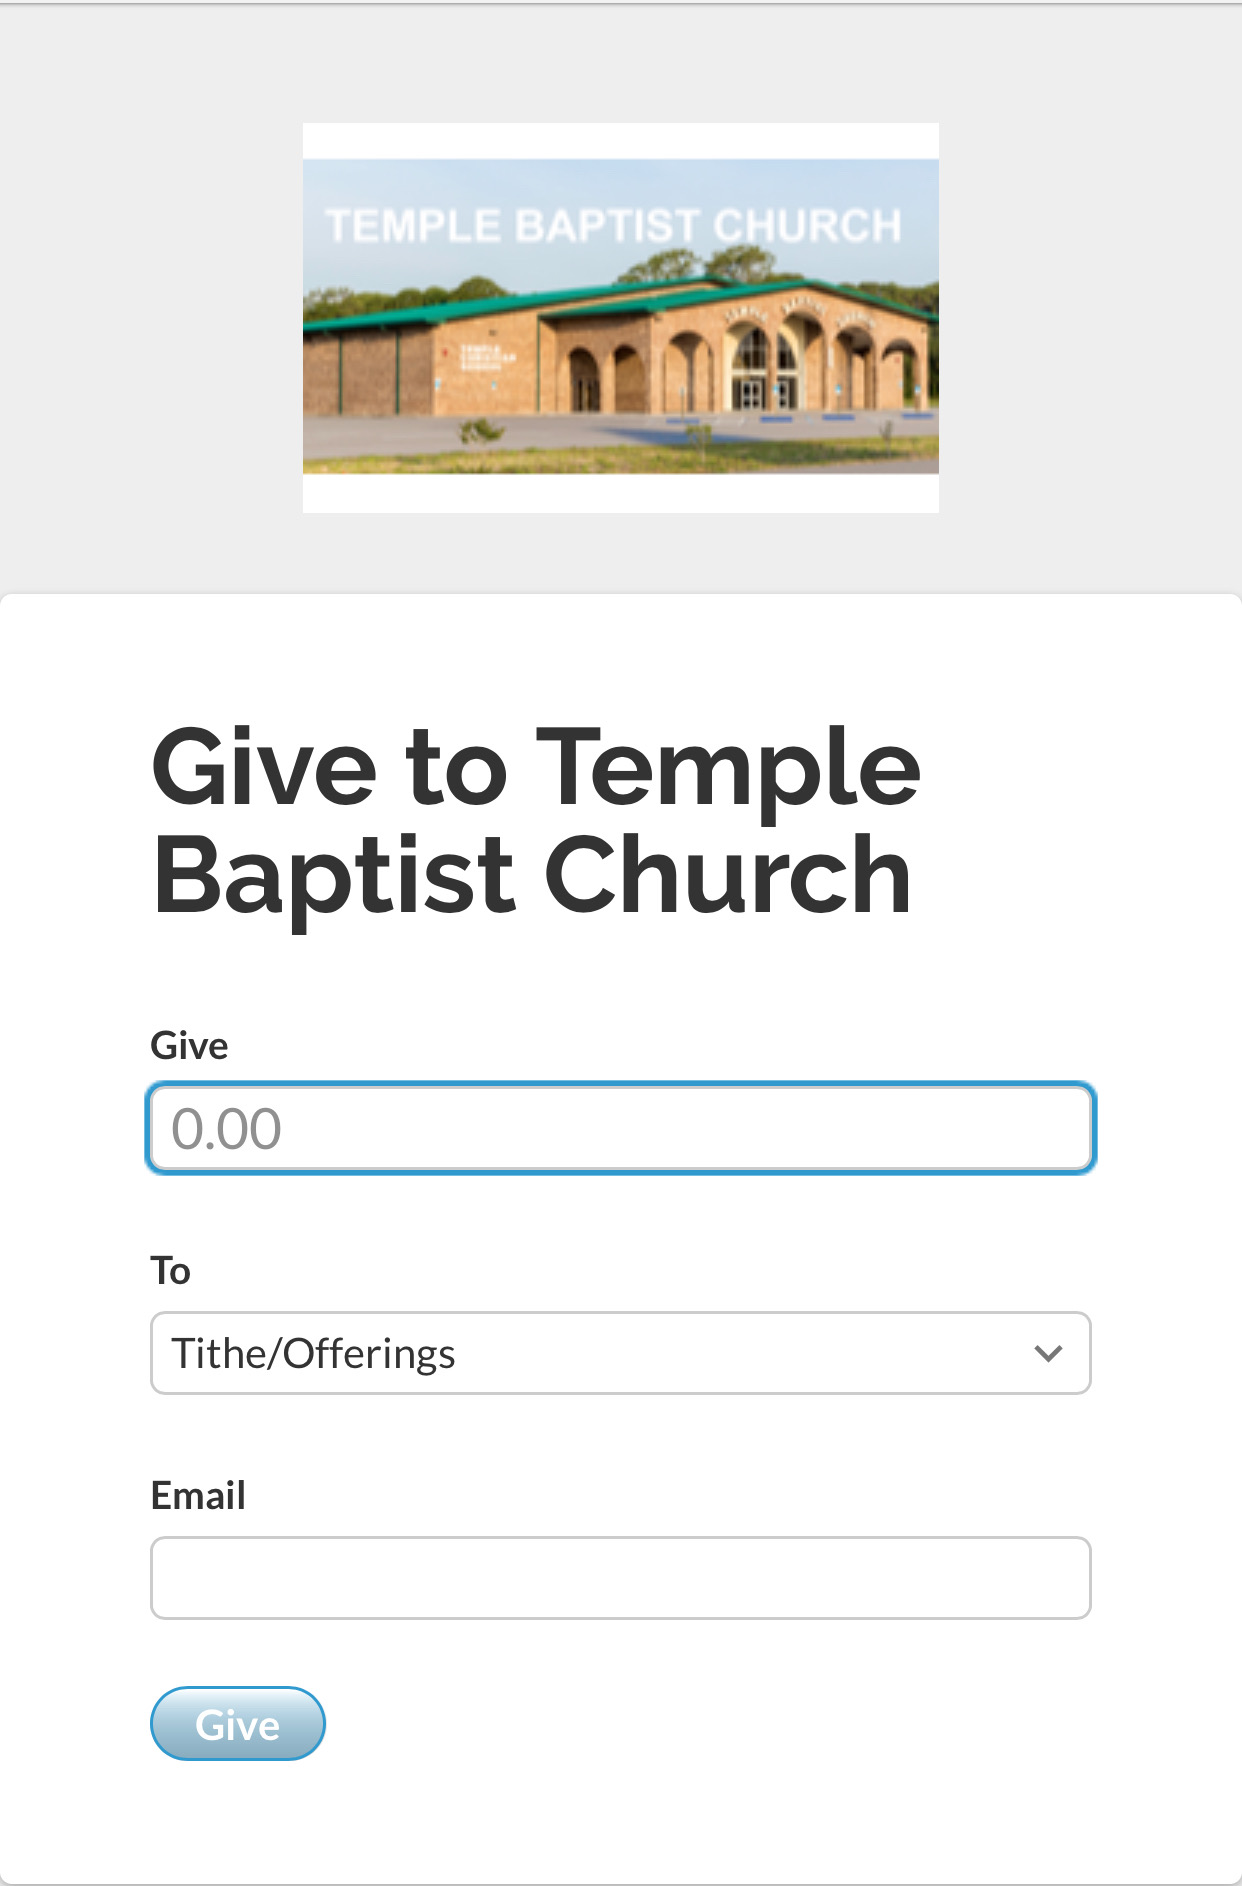 TempleBC Giving-phone-3.JPG